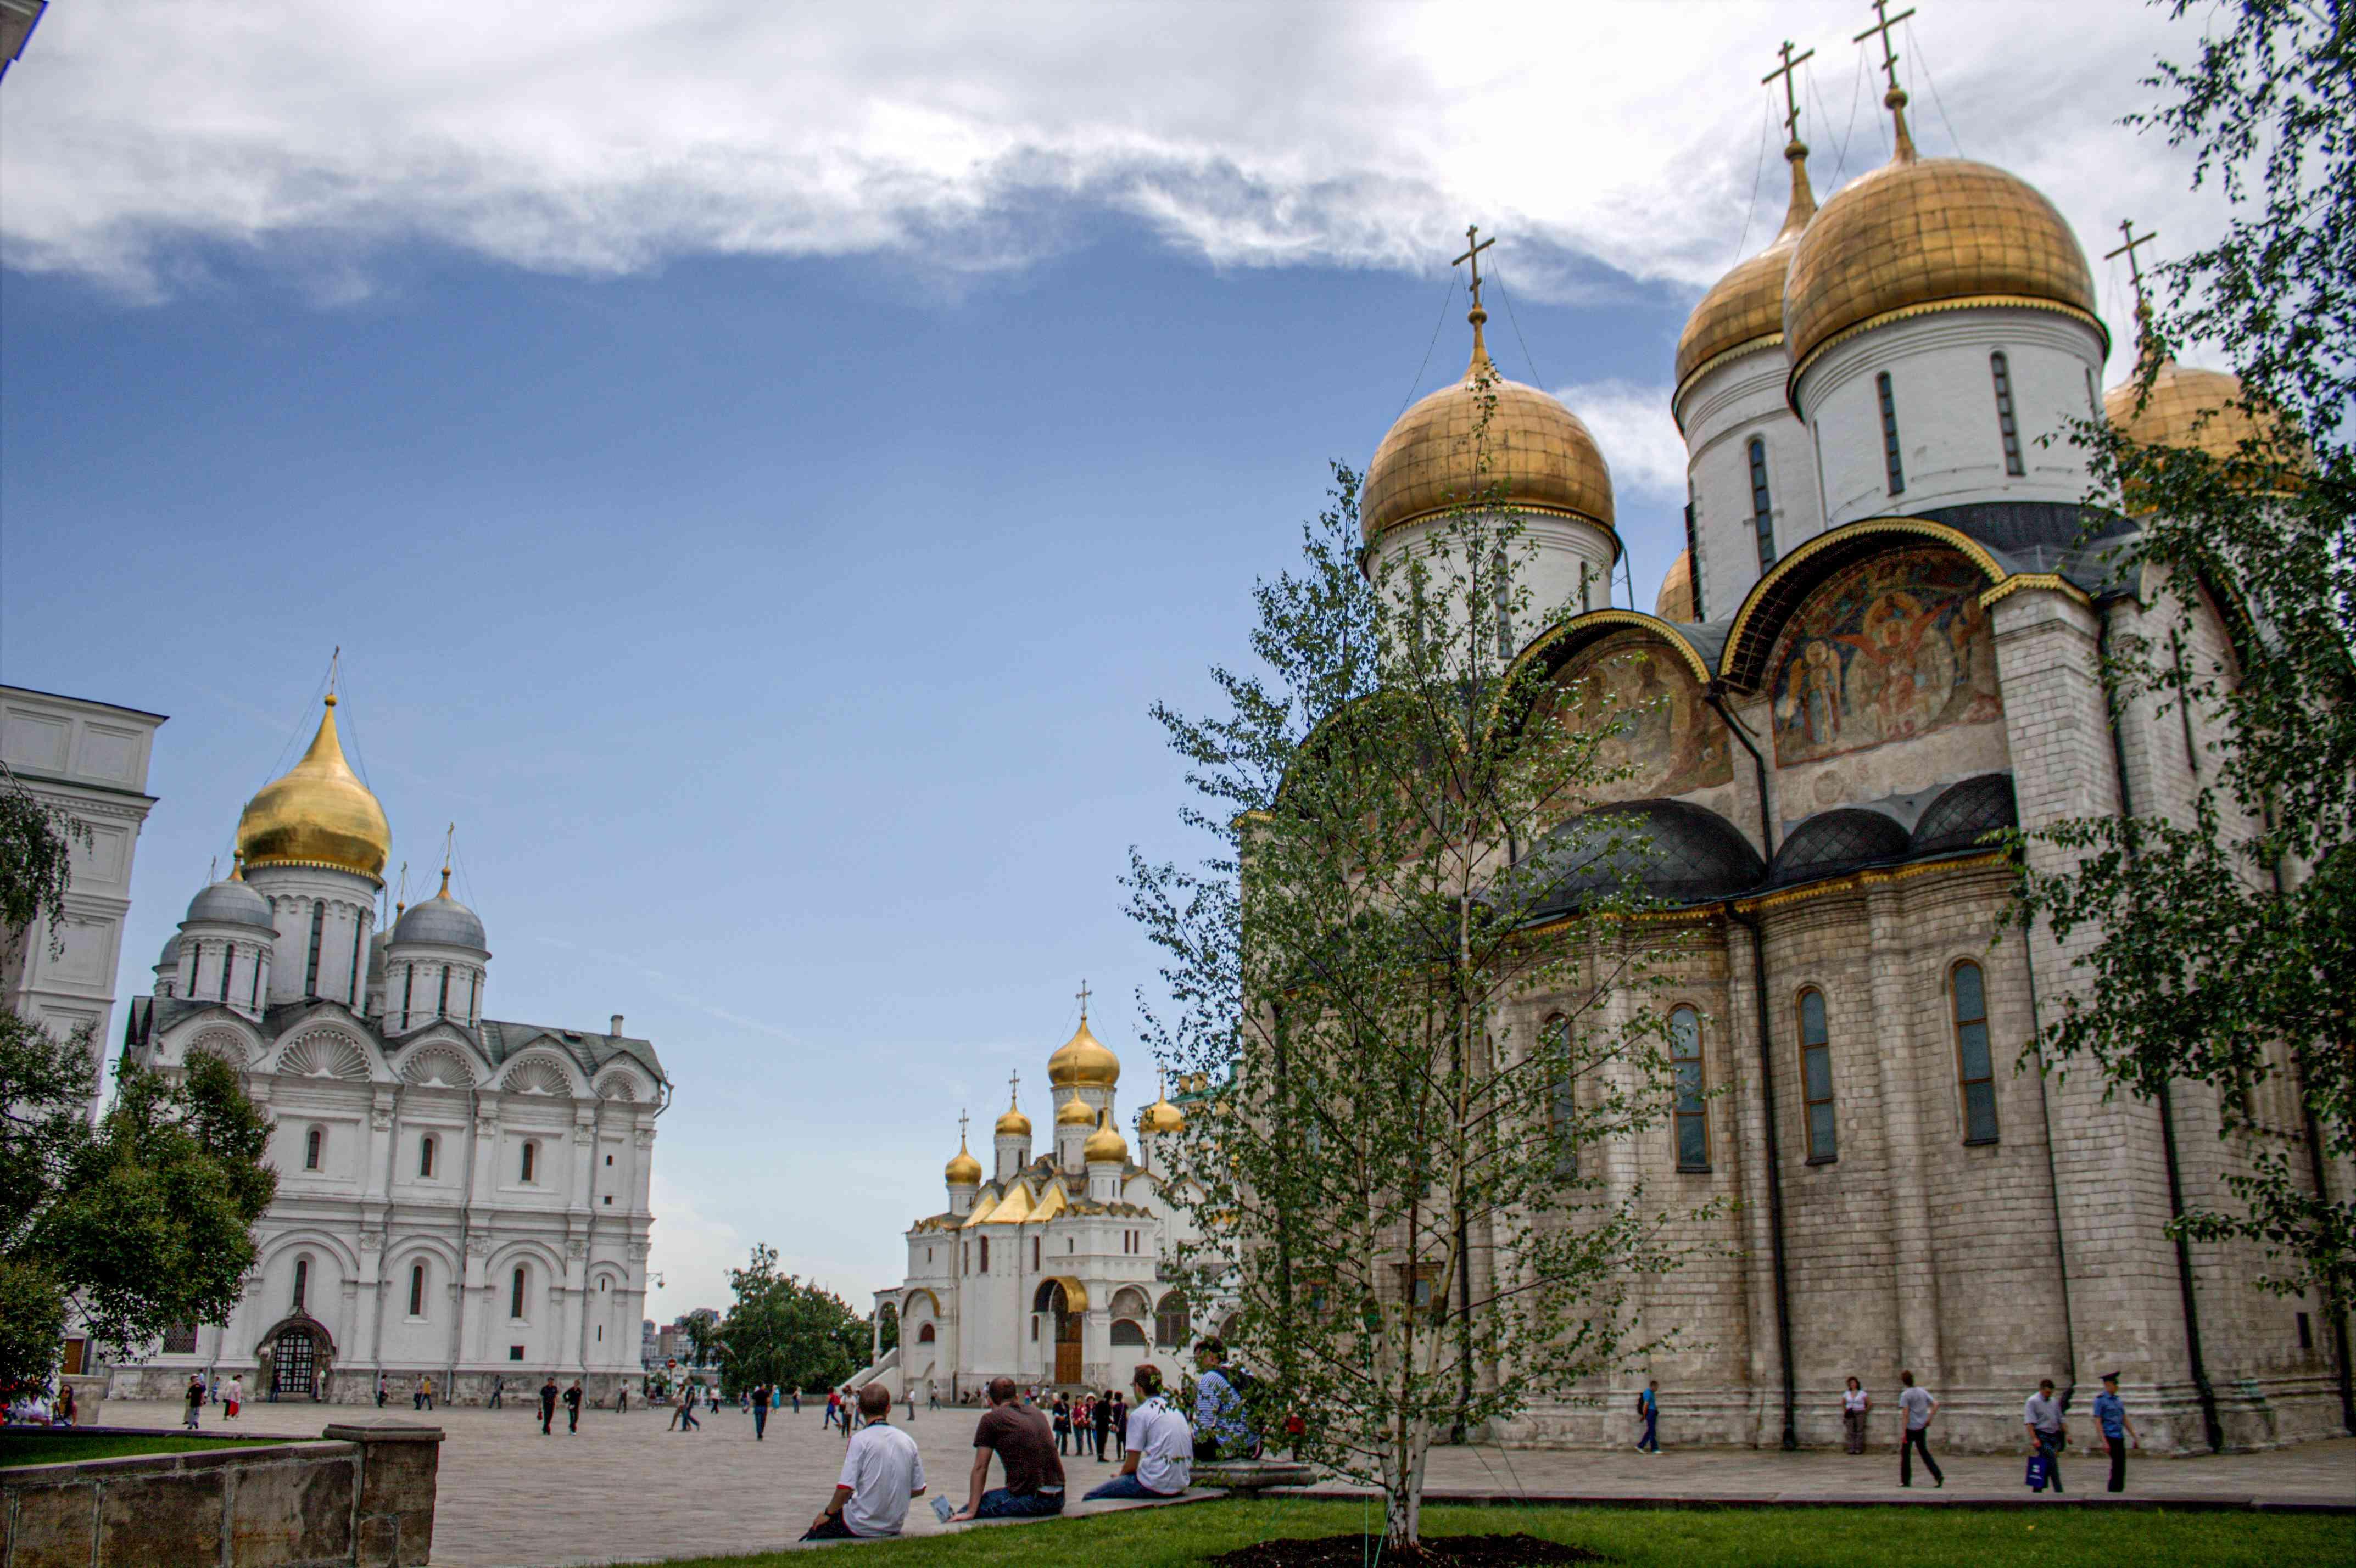 The Kremlin building